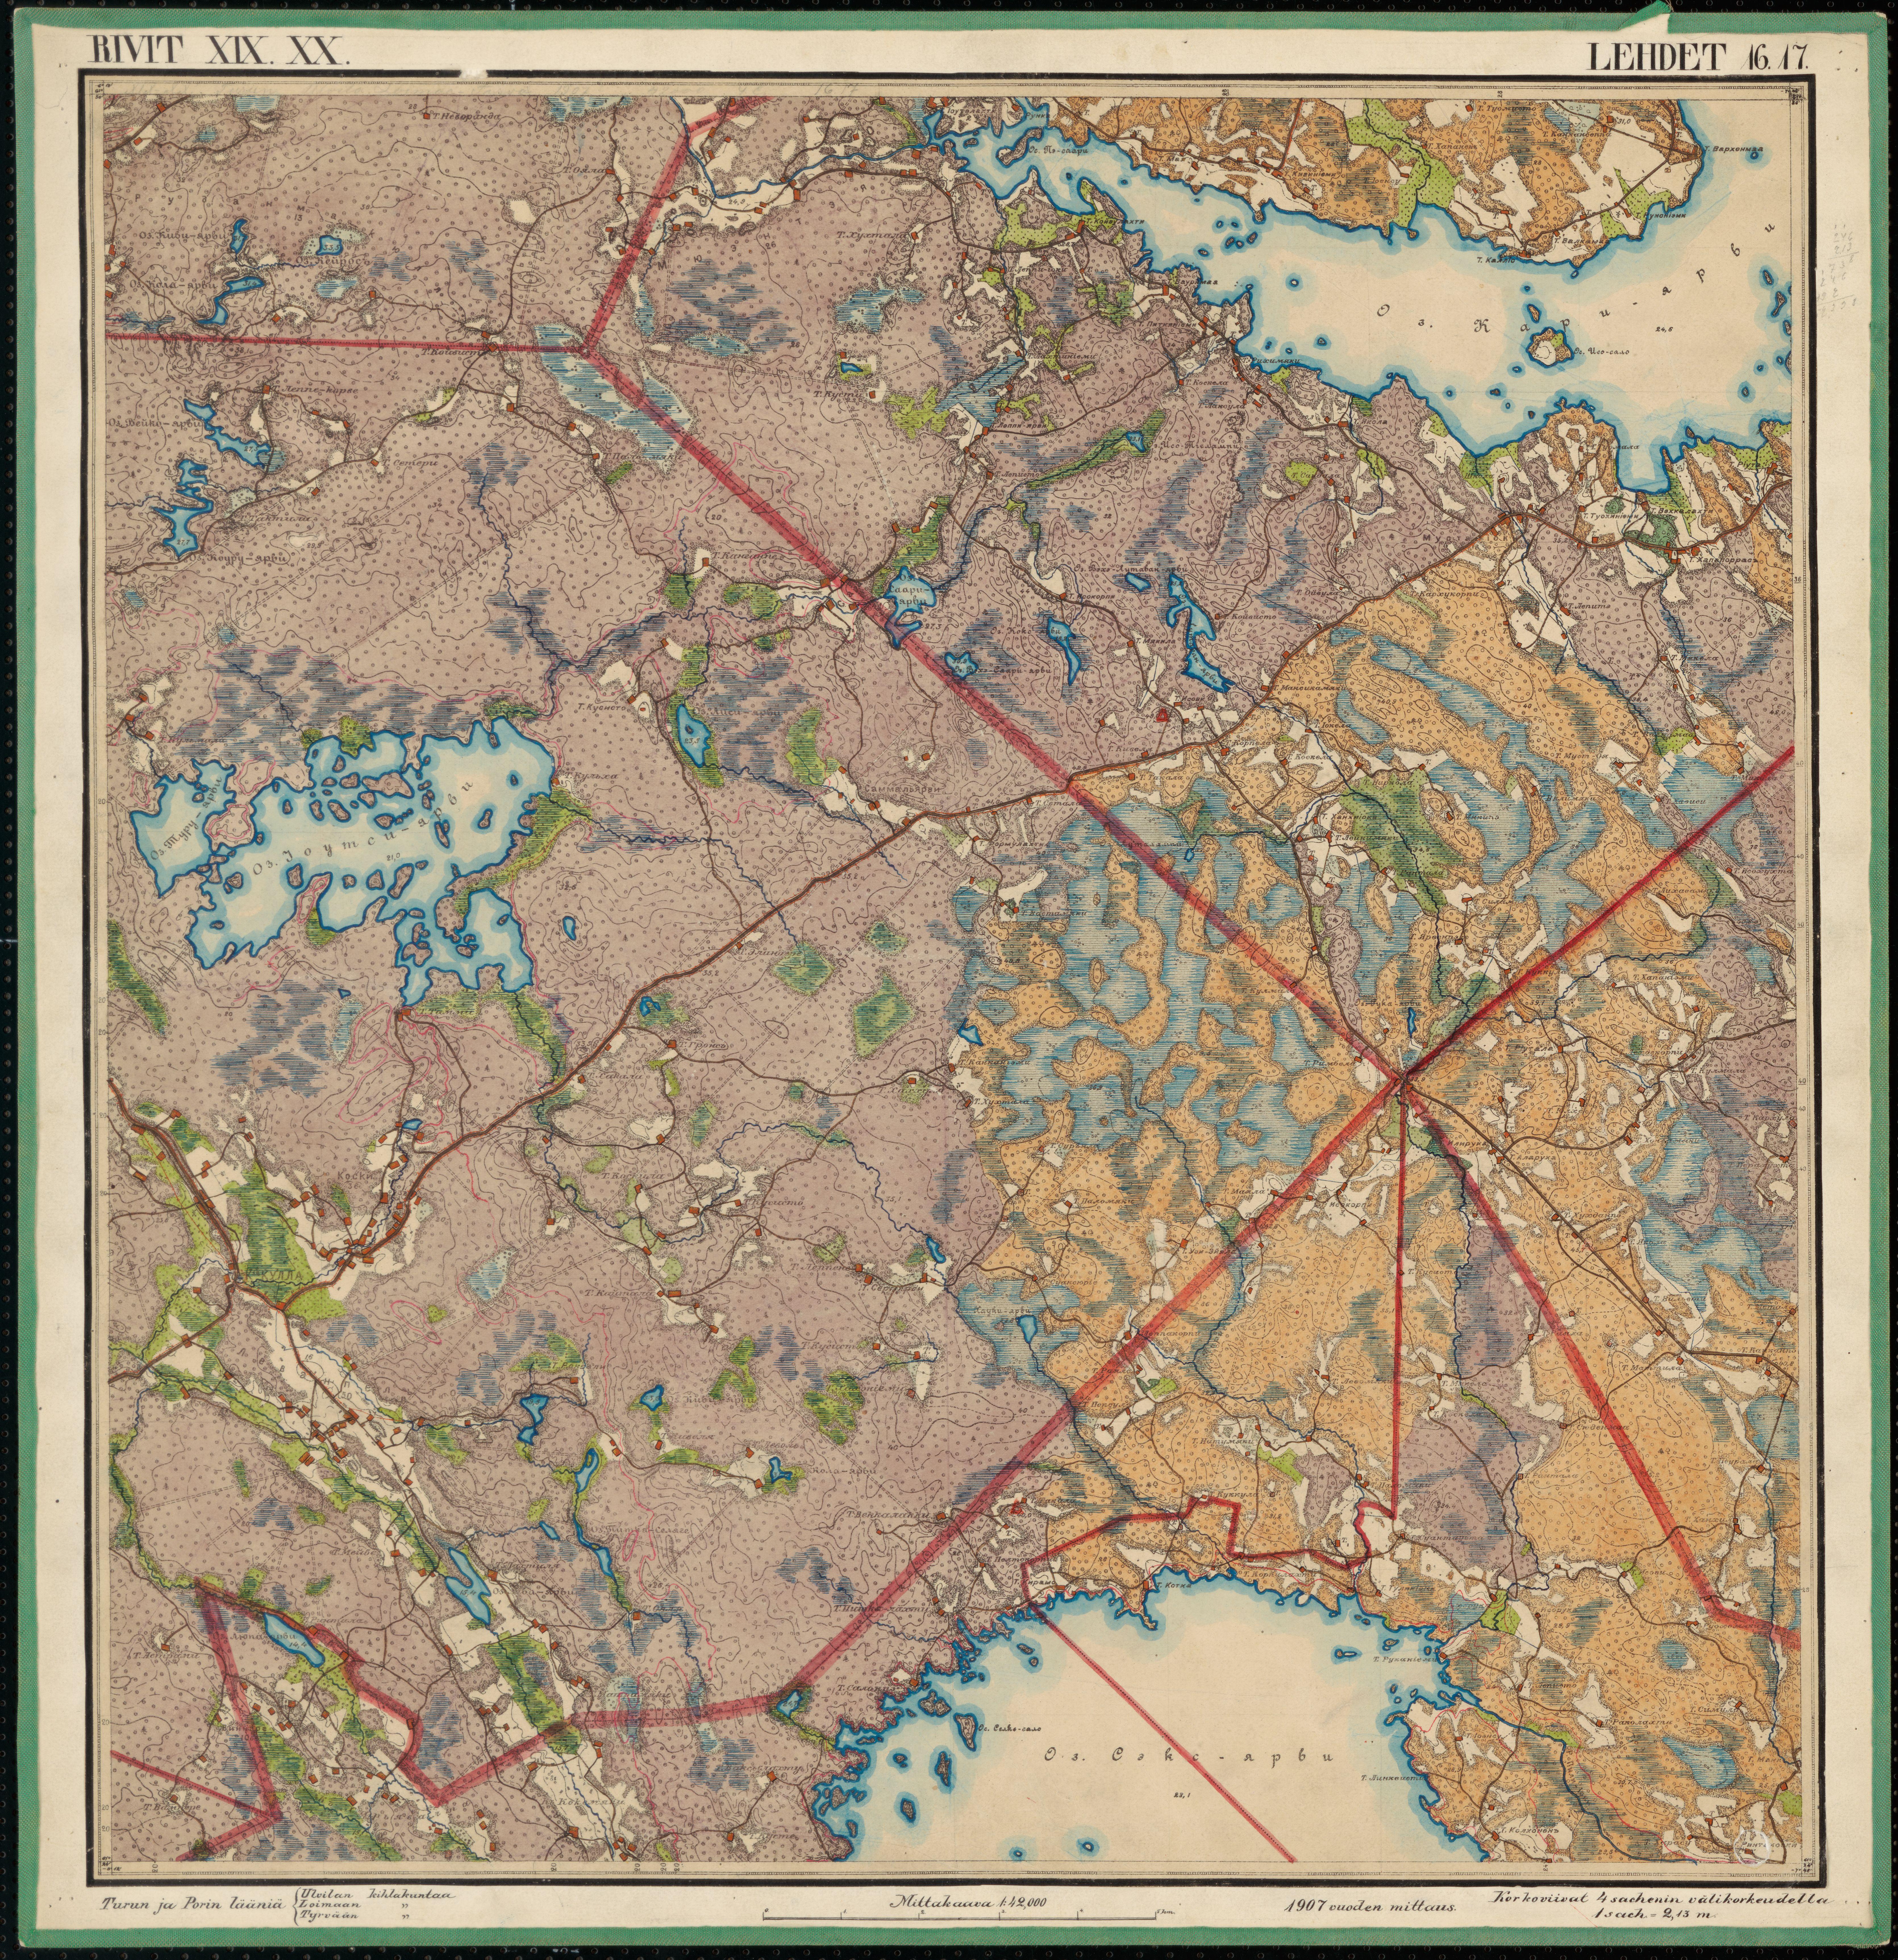 File Senate Atlas 1870 1907 Sheet Xix Xx 16 17 Kullaa Jpg